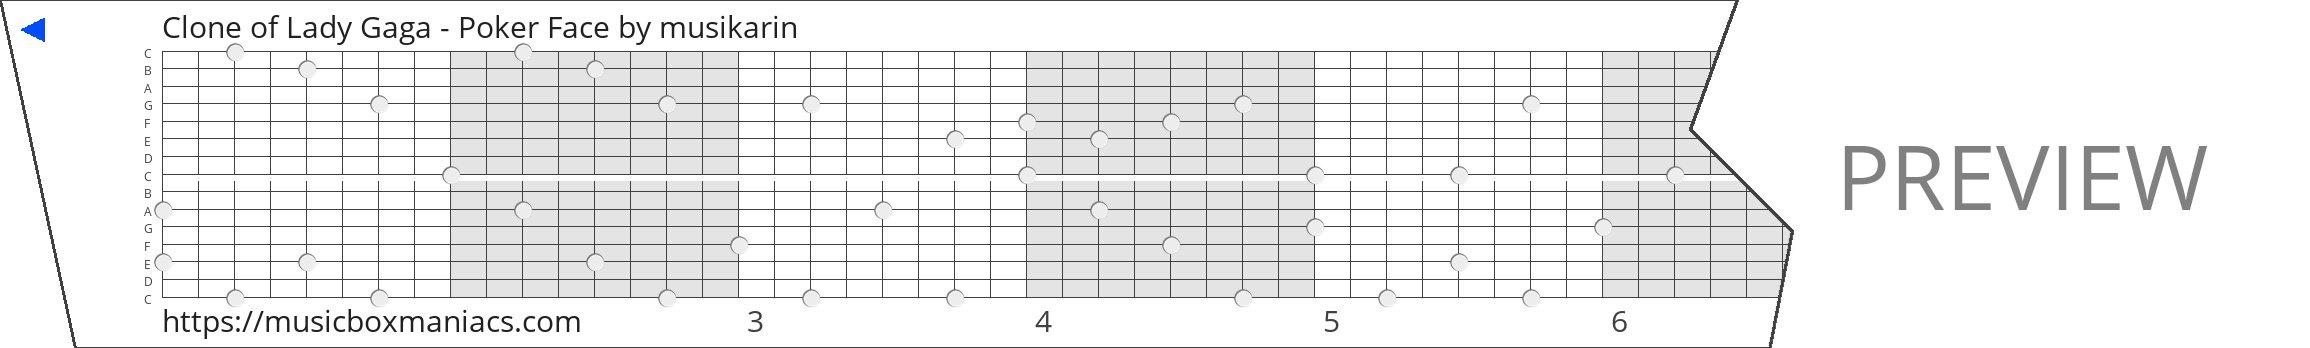 Clone of Lady Gaga - Poker Face 15 note music box paper strip